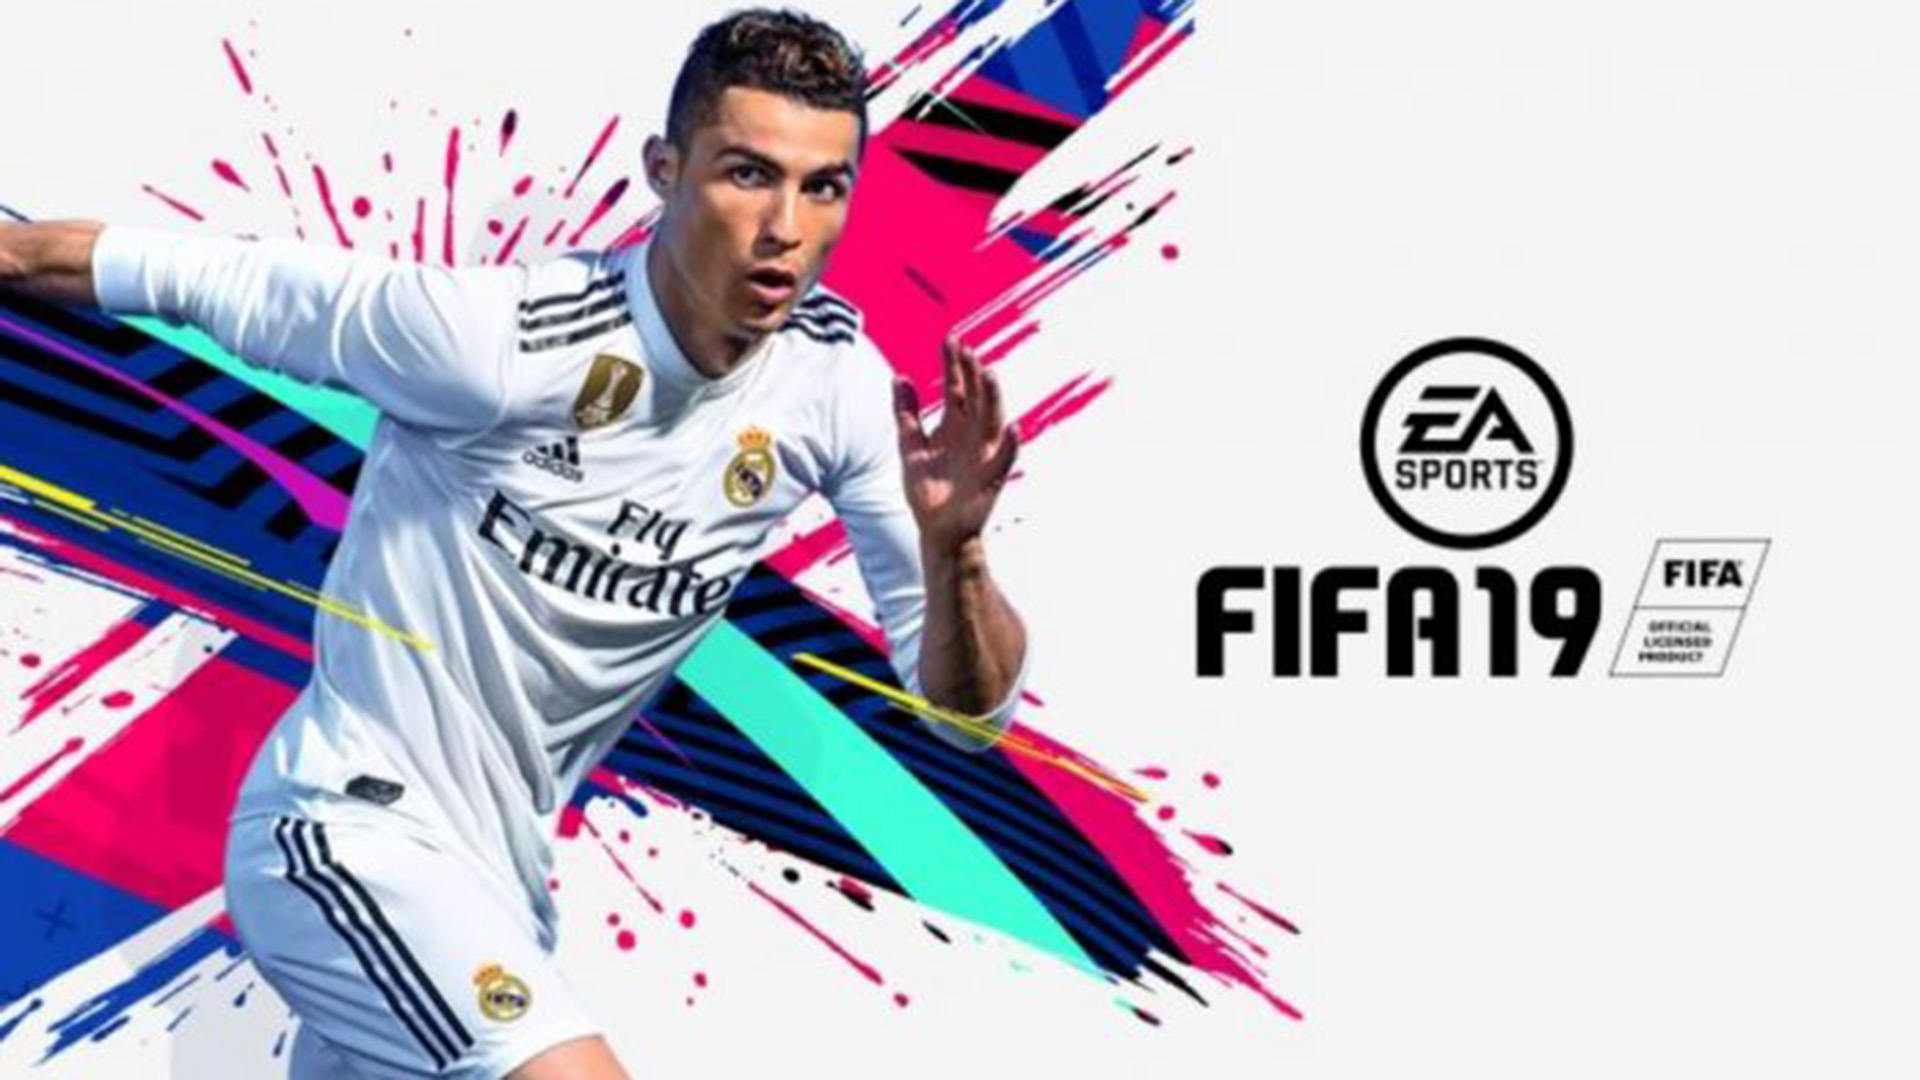 Cristiano Ronaldo es la portada del FIFA 19